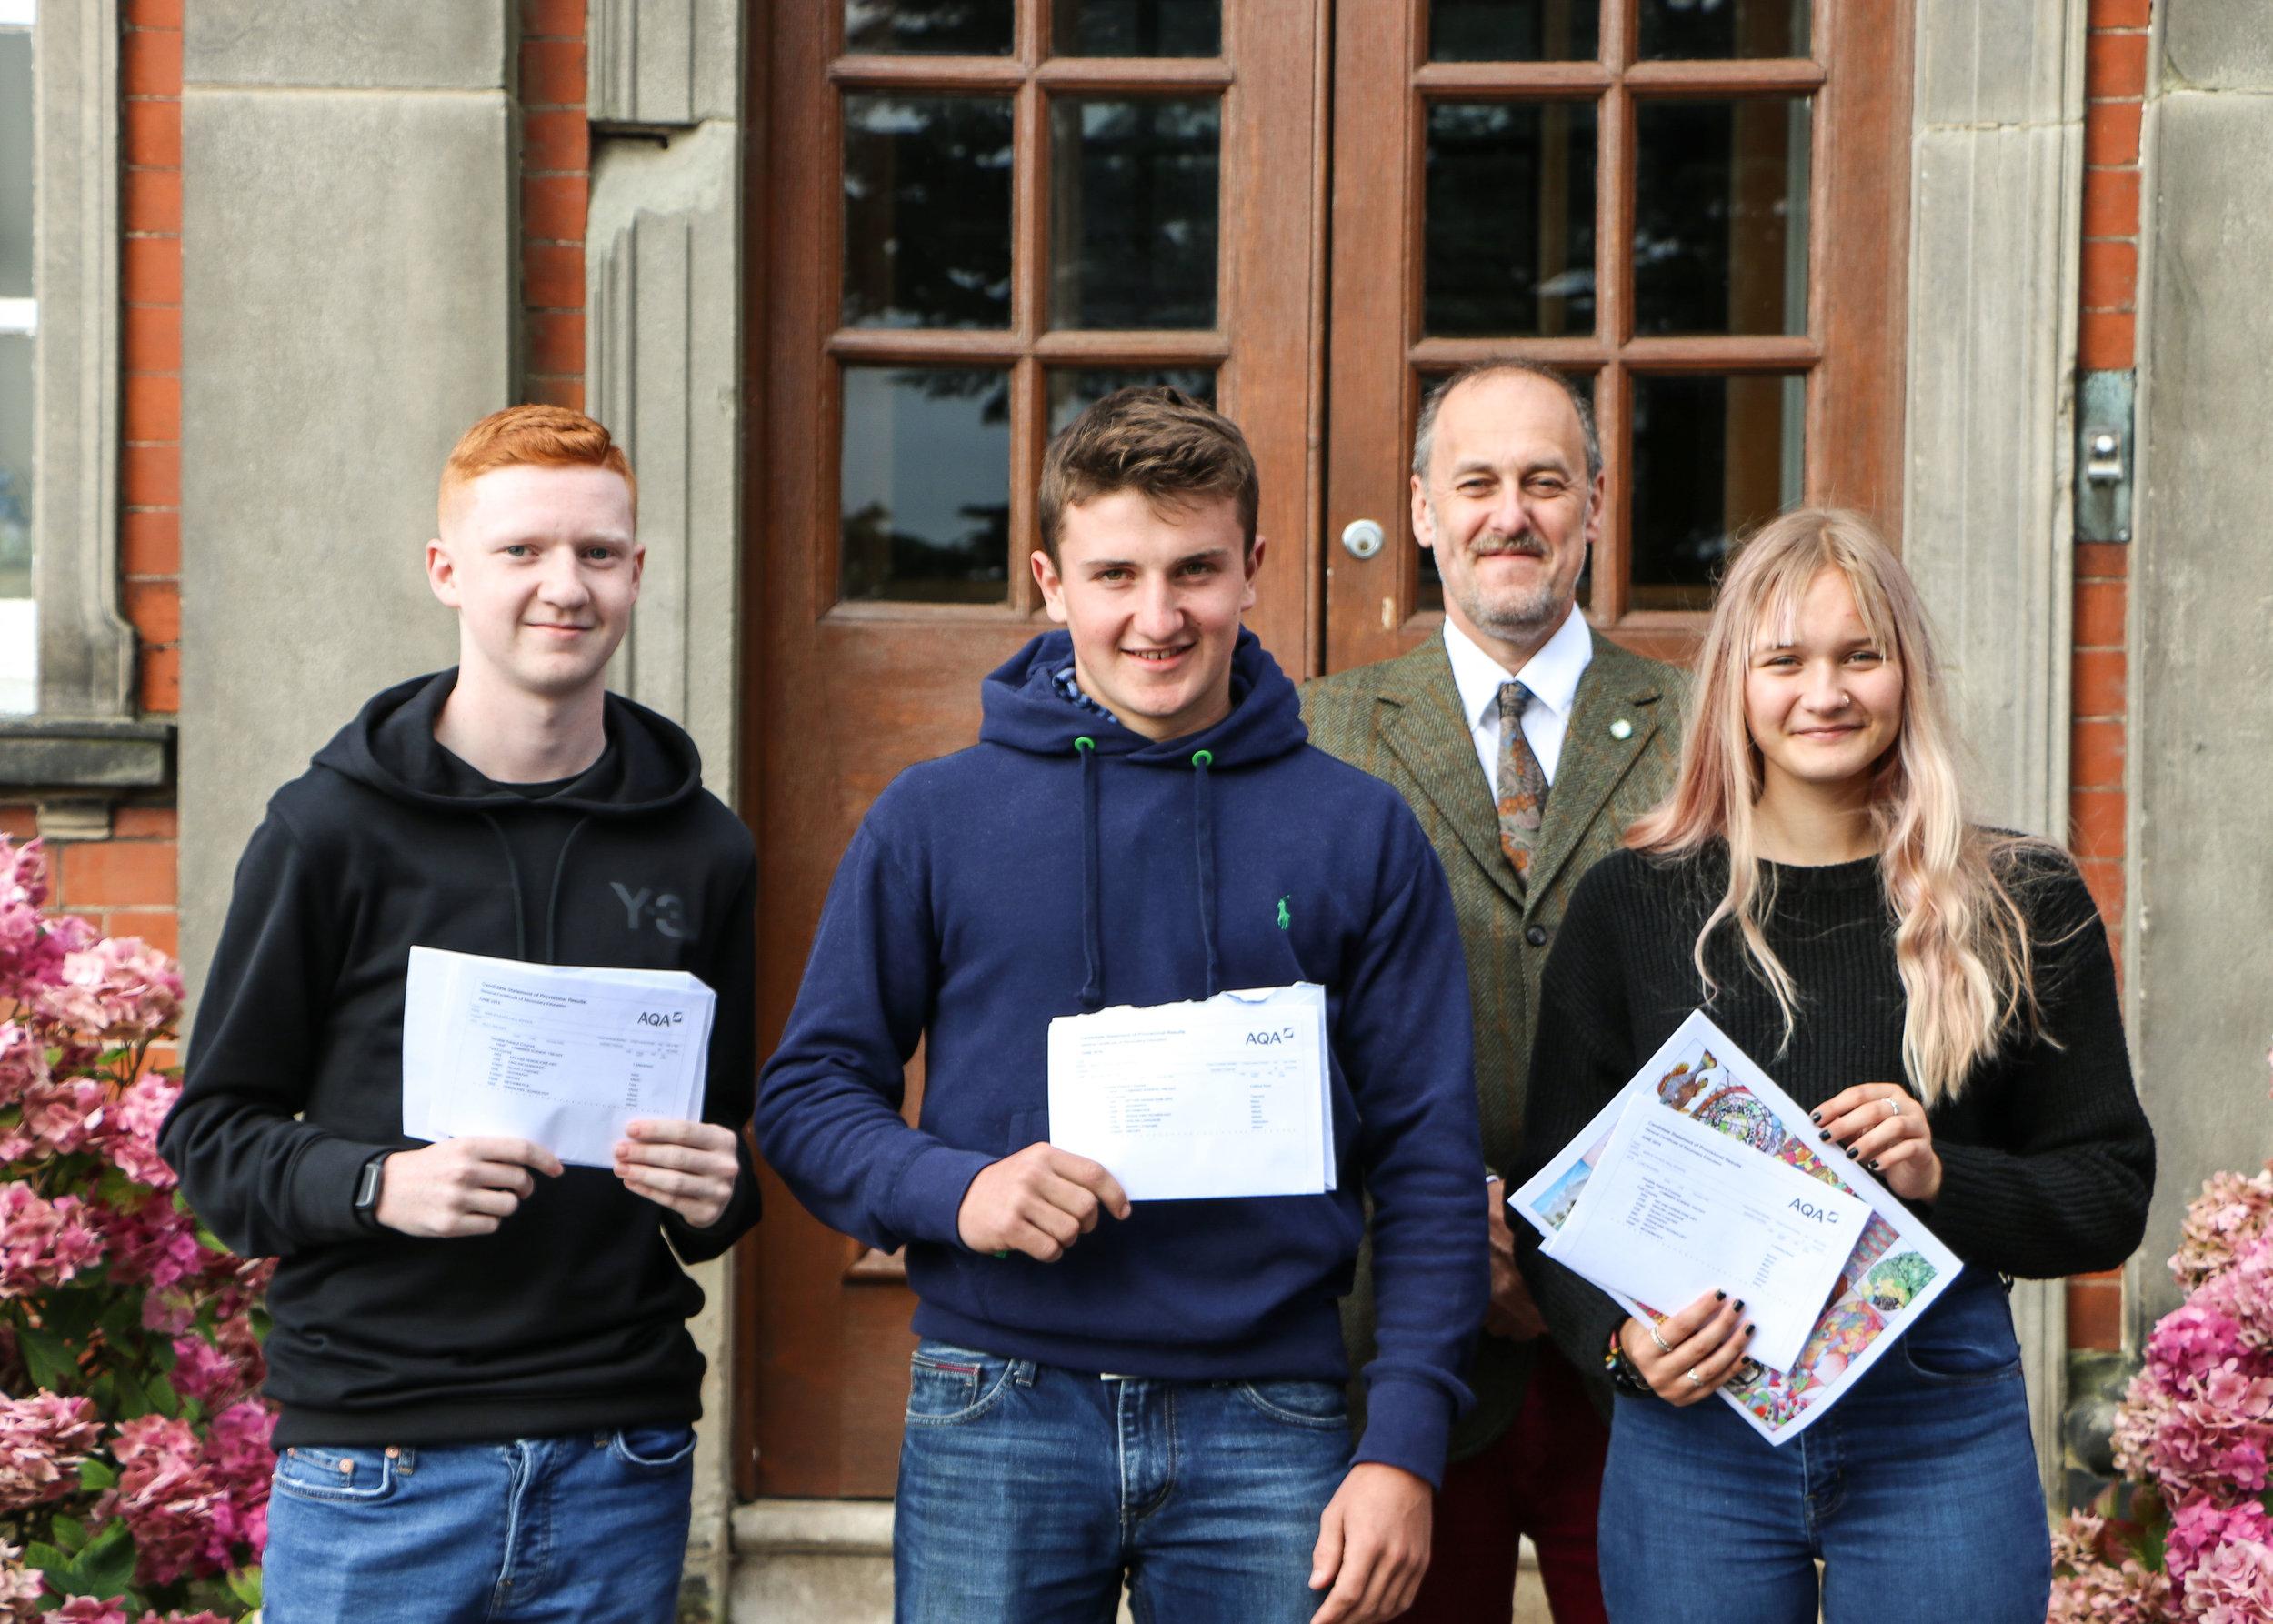 MapleHayes-GCSE-2019-GCSE Results-Lichfield-Dyslexia School-.jpg